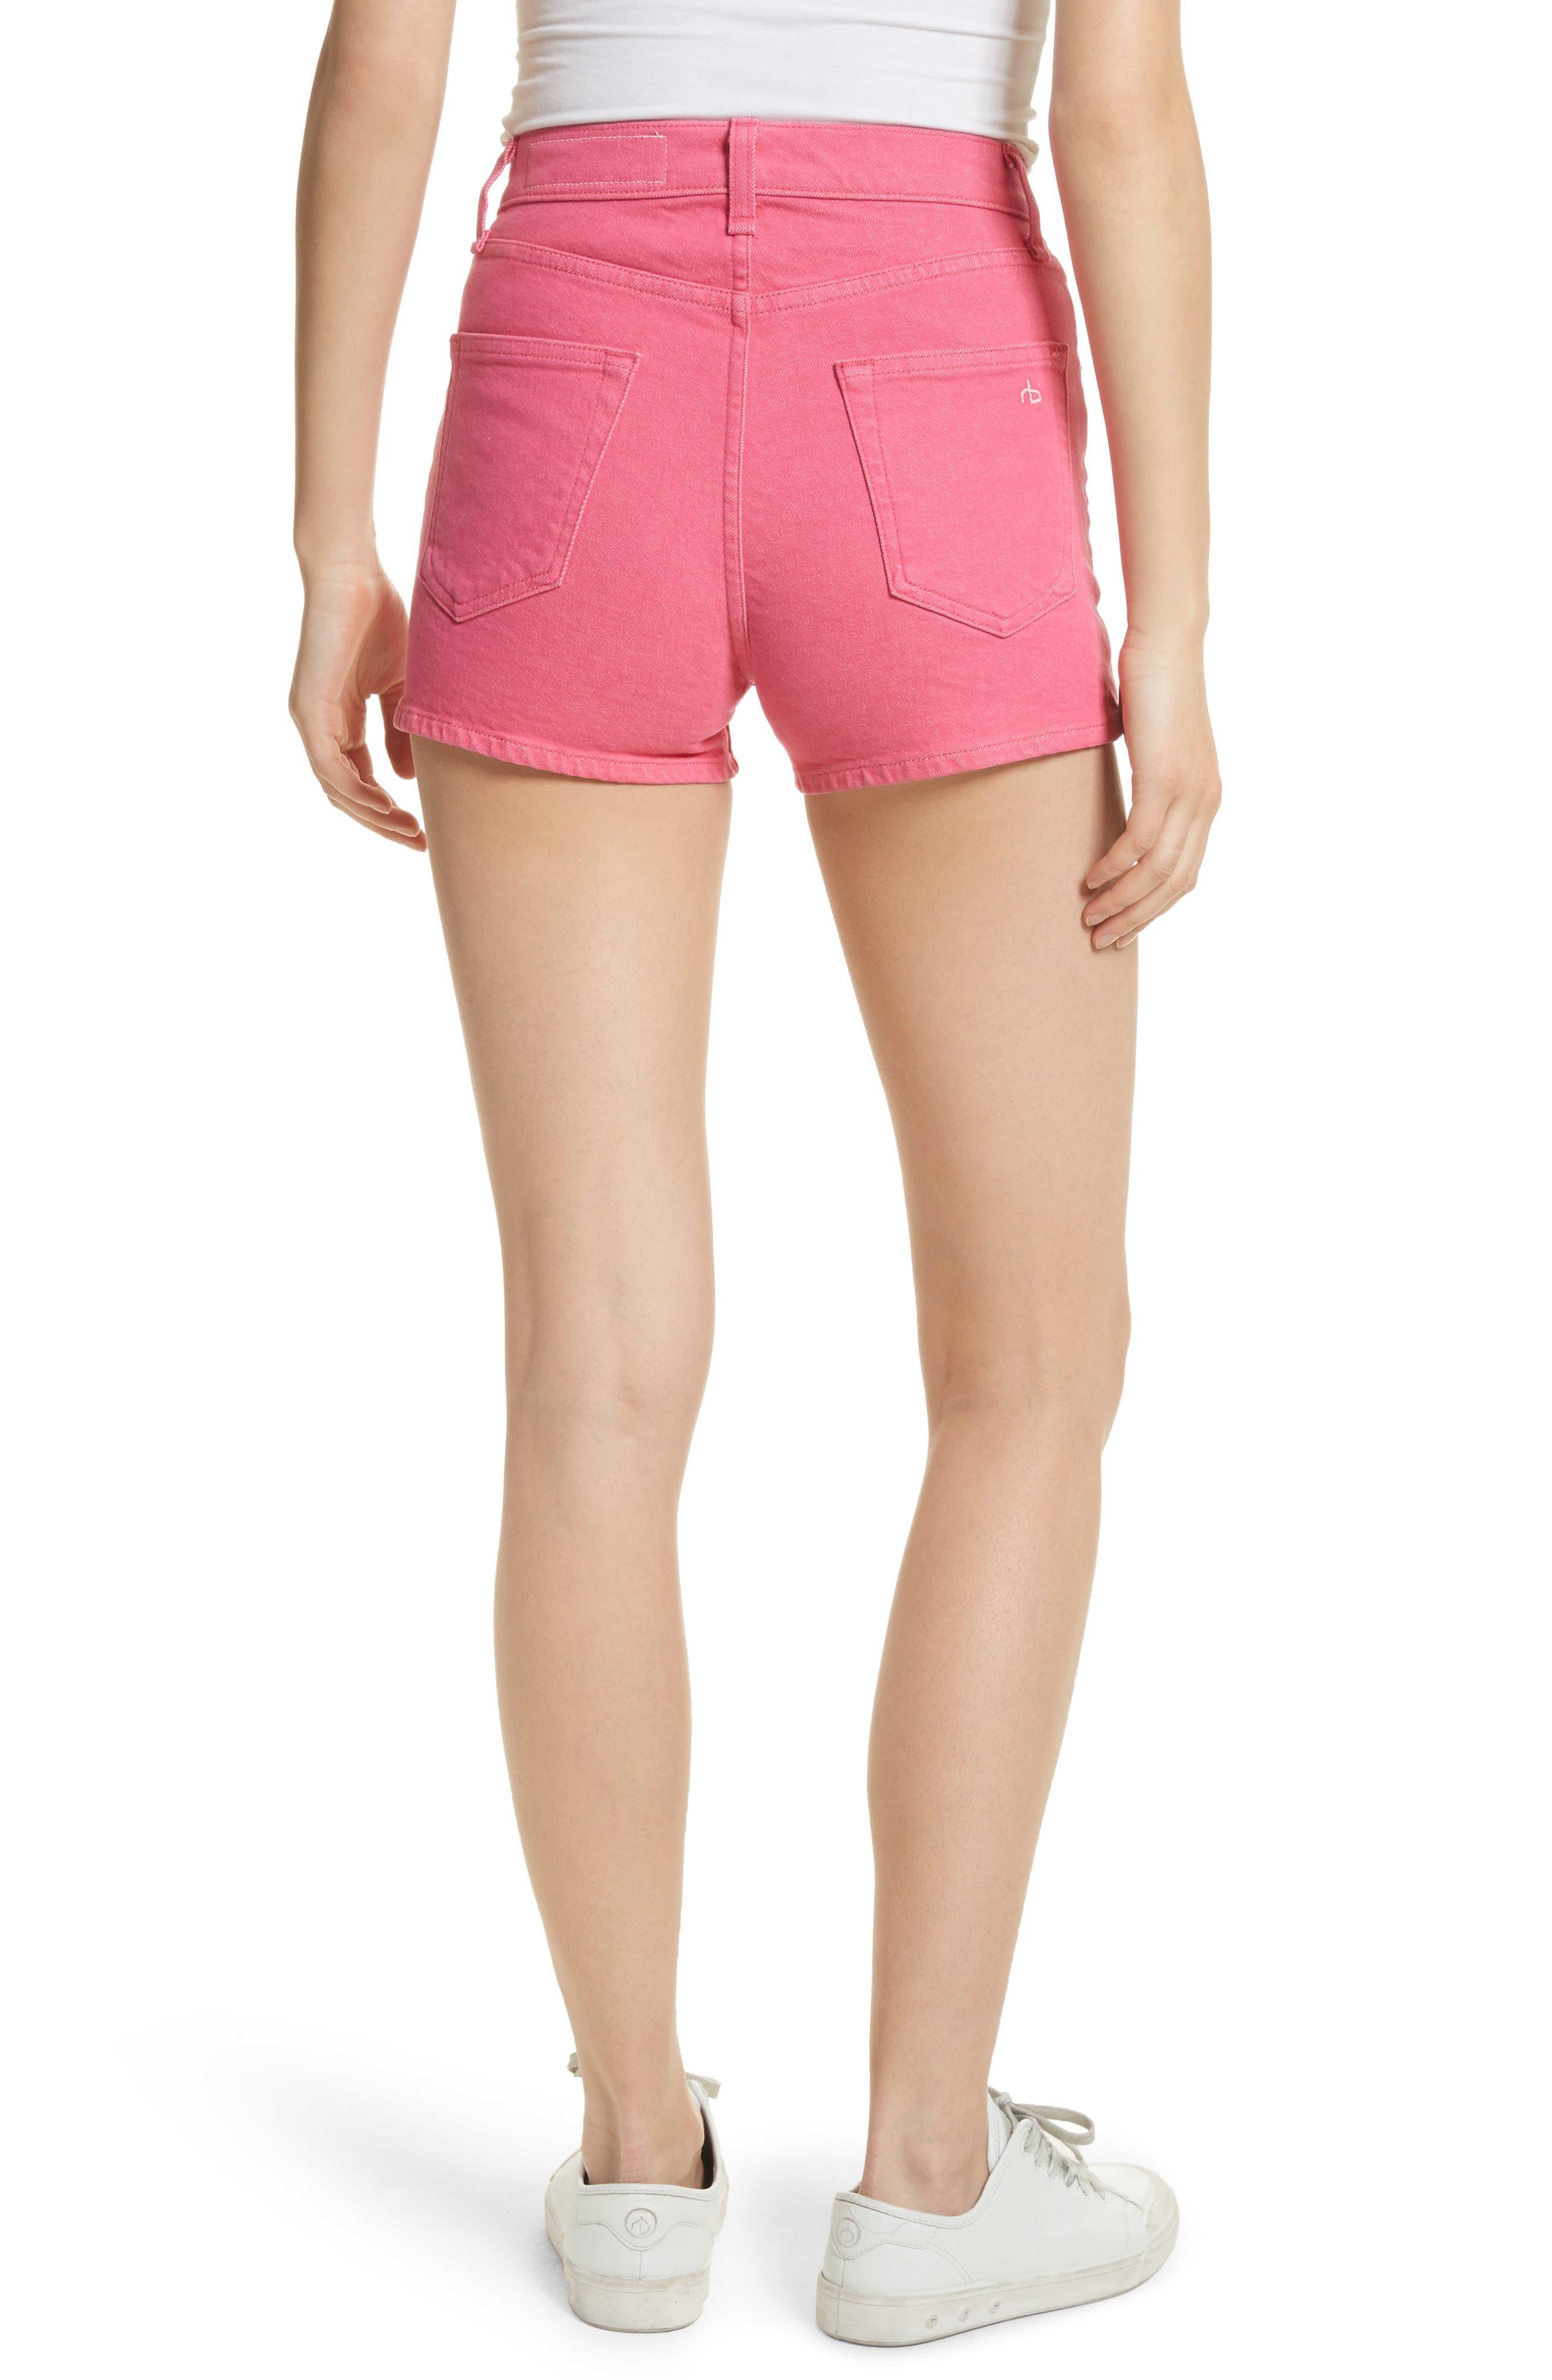 Justine High Waist Denim Shorts,                             Alternate thumbnail 2, color,                             Bull Pink